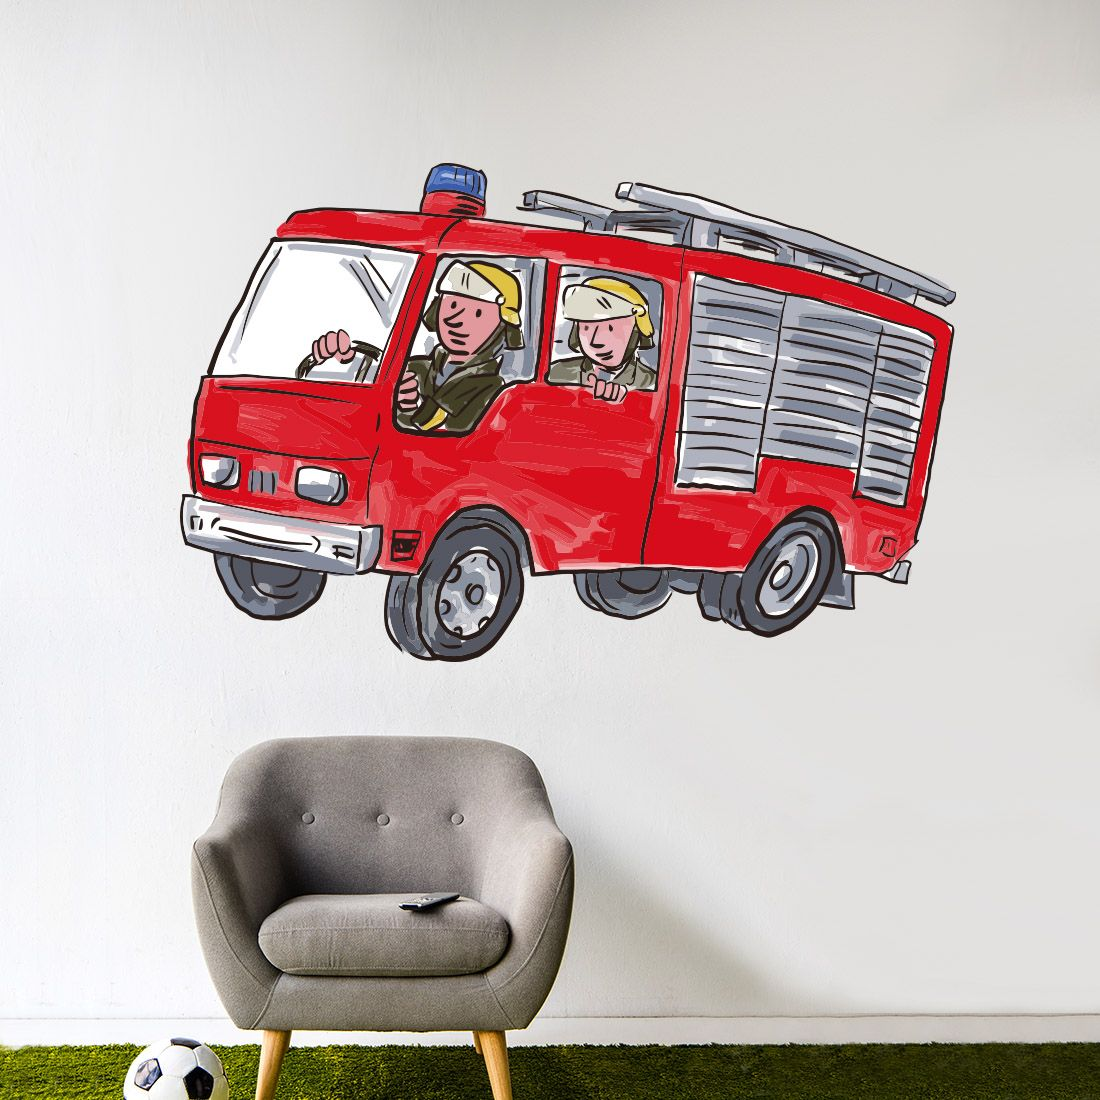 Muursticker Brandweerauto Kinderkamer 9 95 Gratis Verzending Muurstickers Brandweerauto Voertuigen